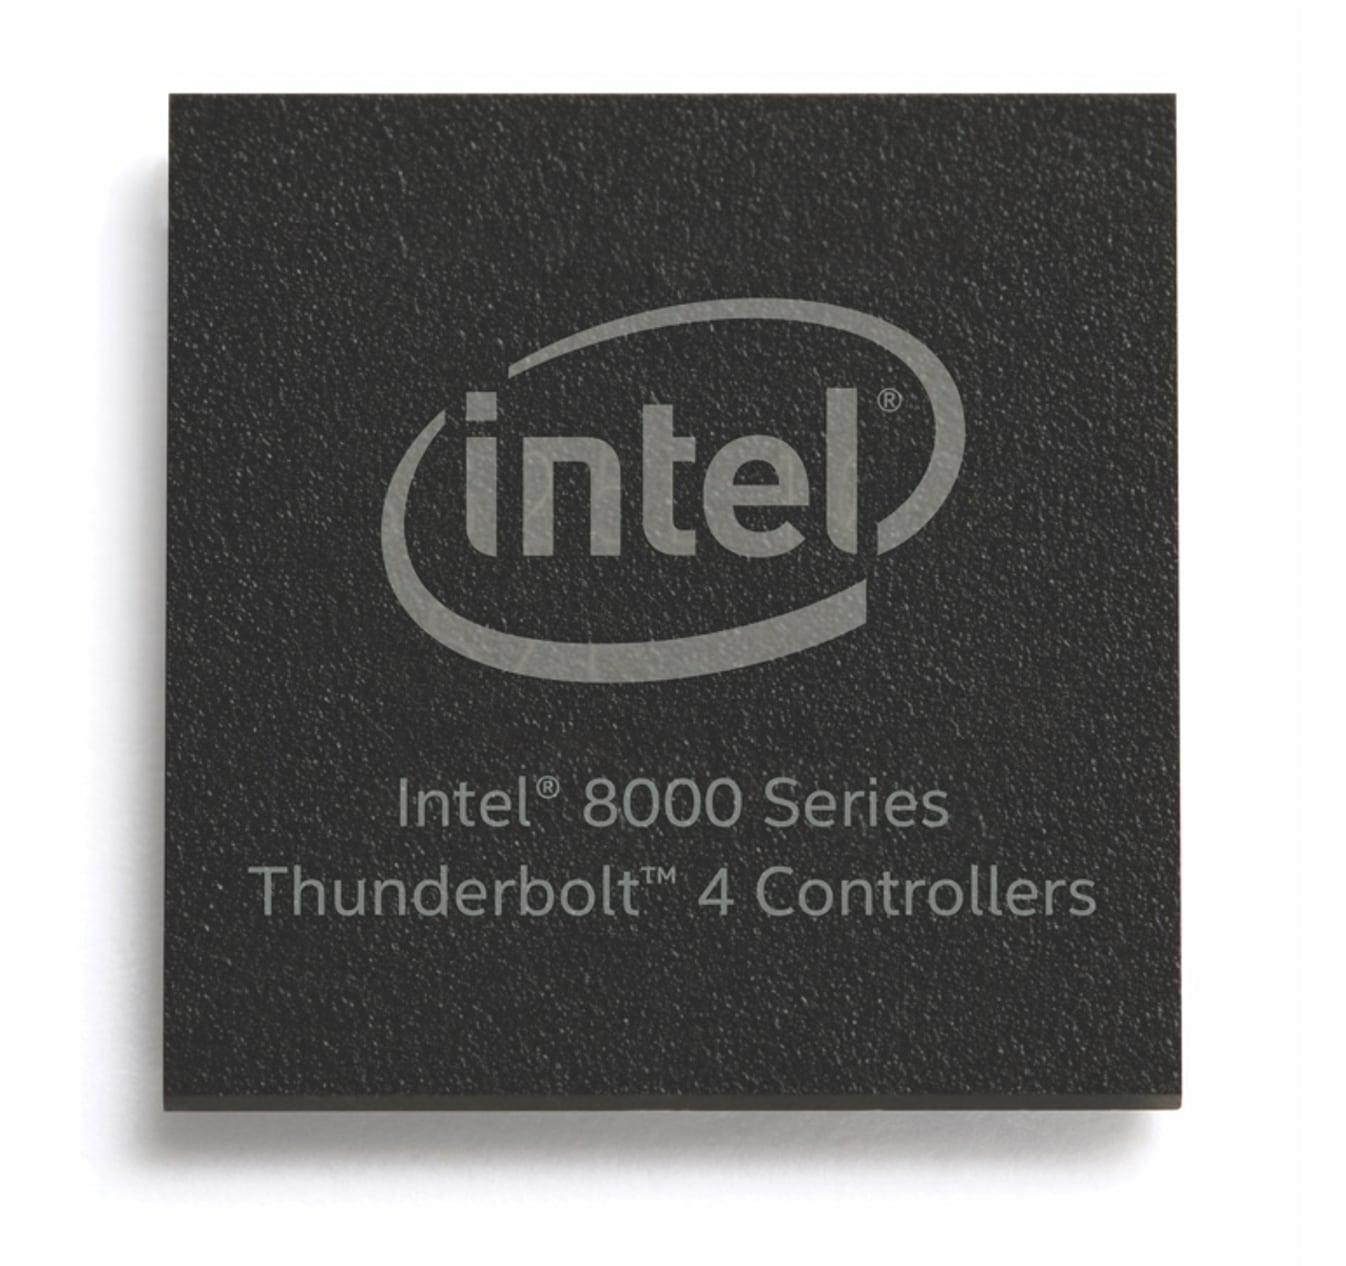 Intel 8000 Series Thunderbolt 4 Controller